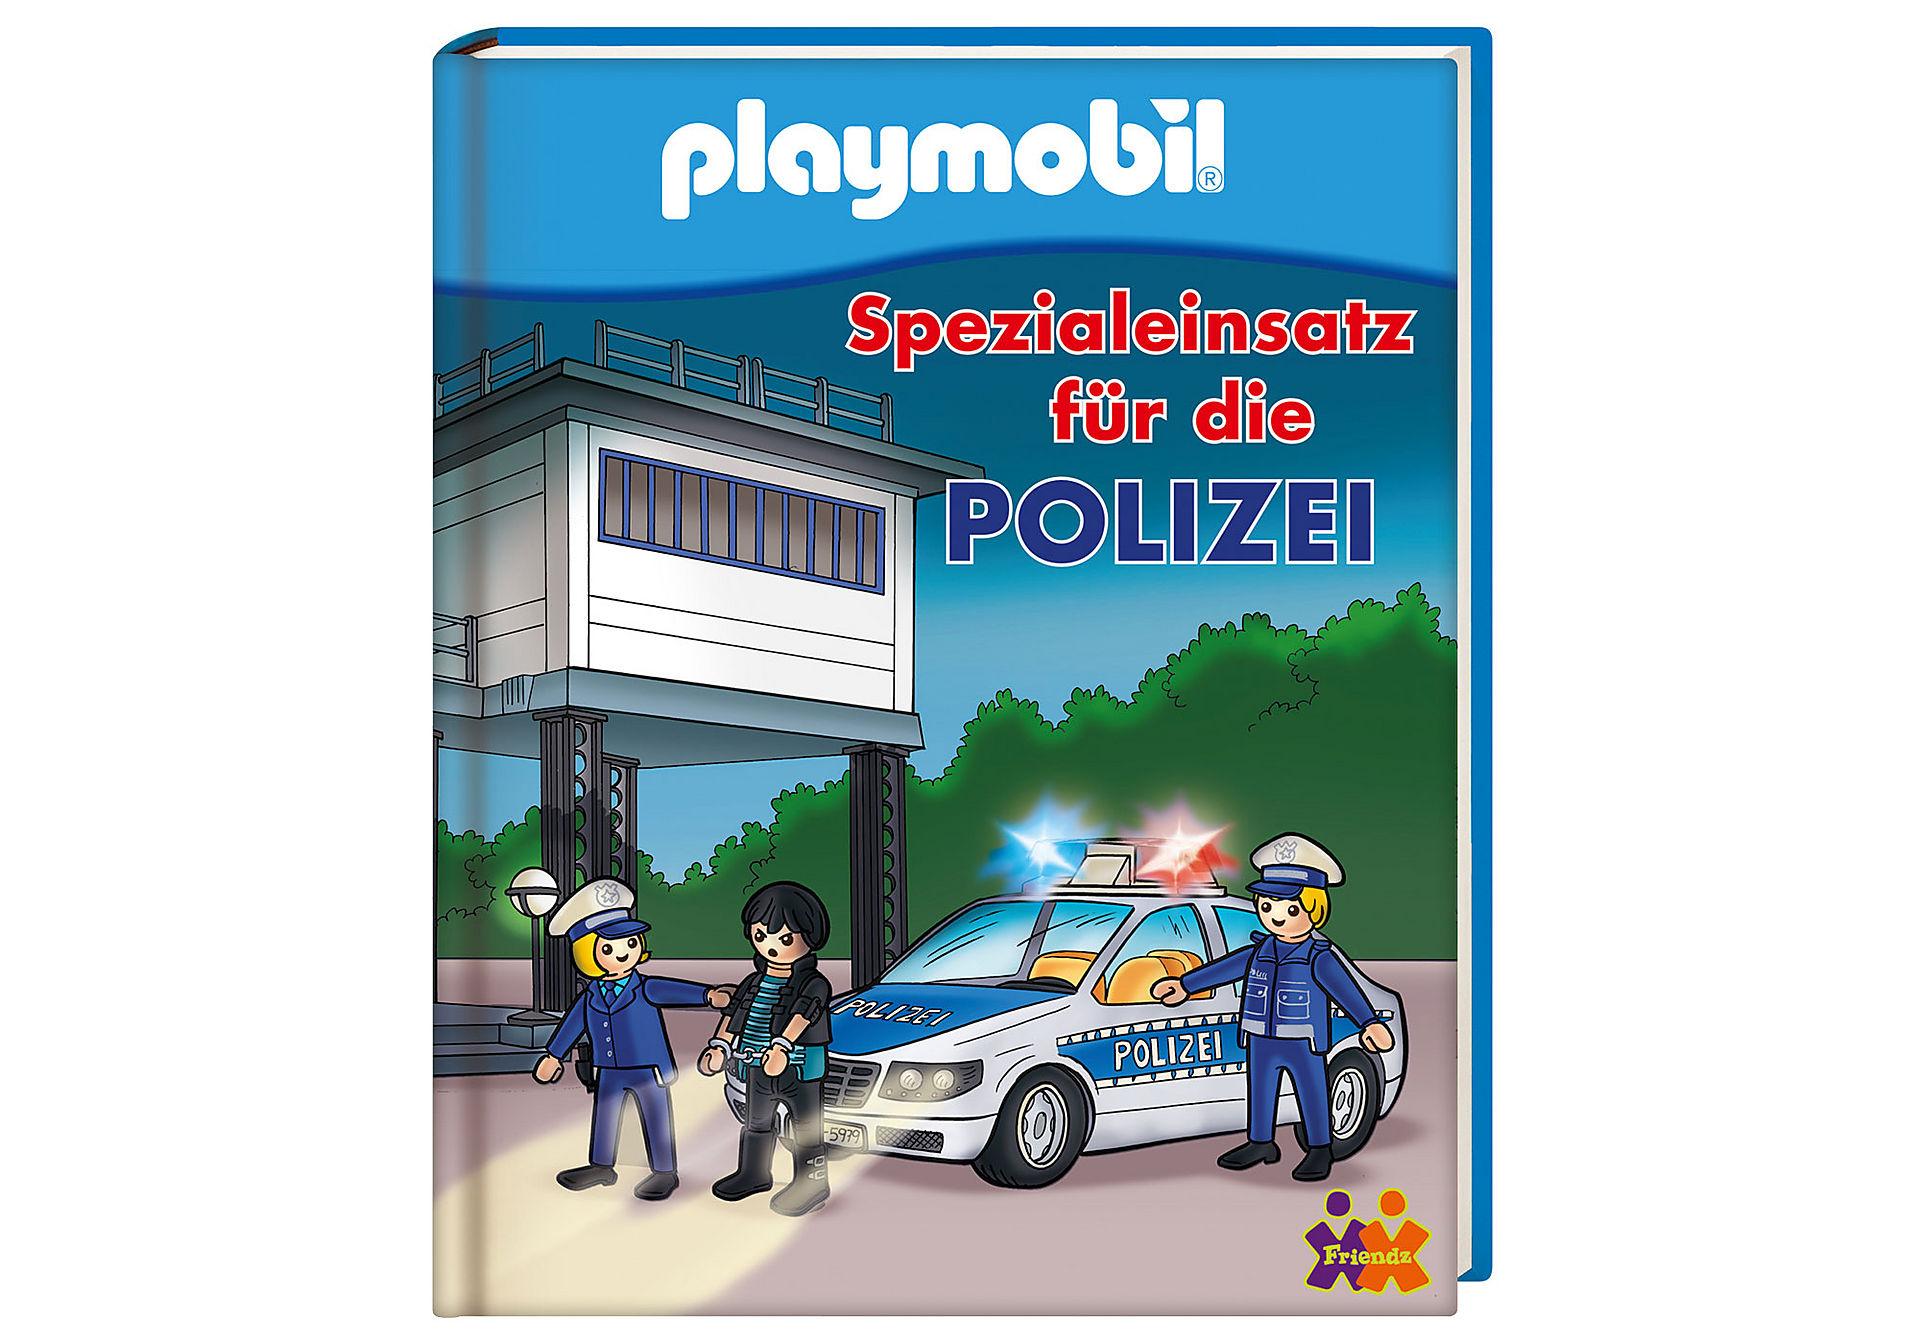 http://media.playmobil.com/i/playmobil/80090_product_detail/Spezialeinsatz für die Polizei